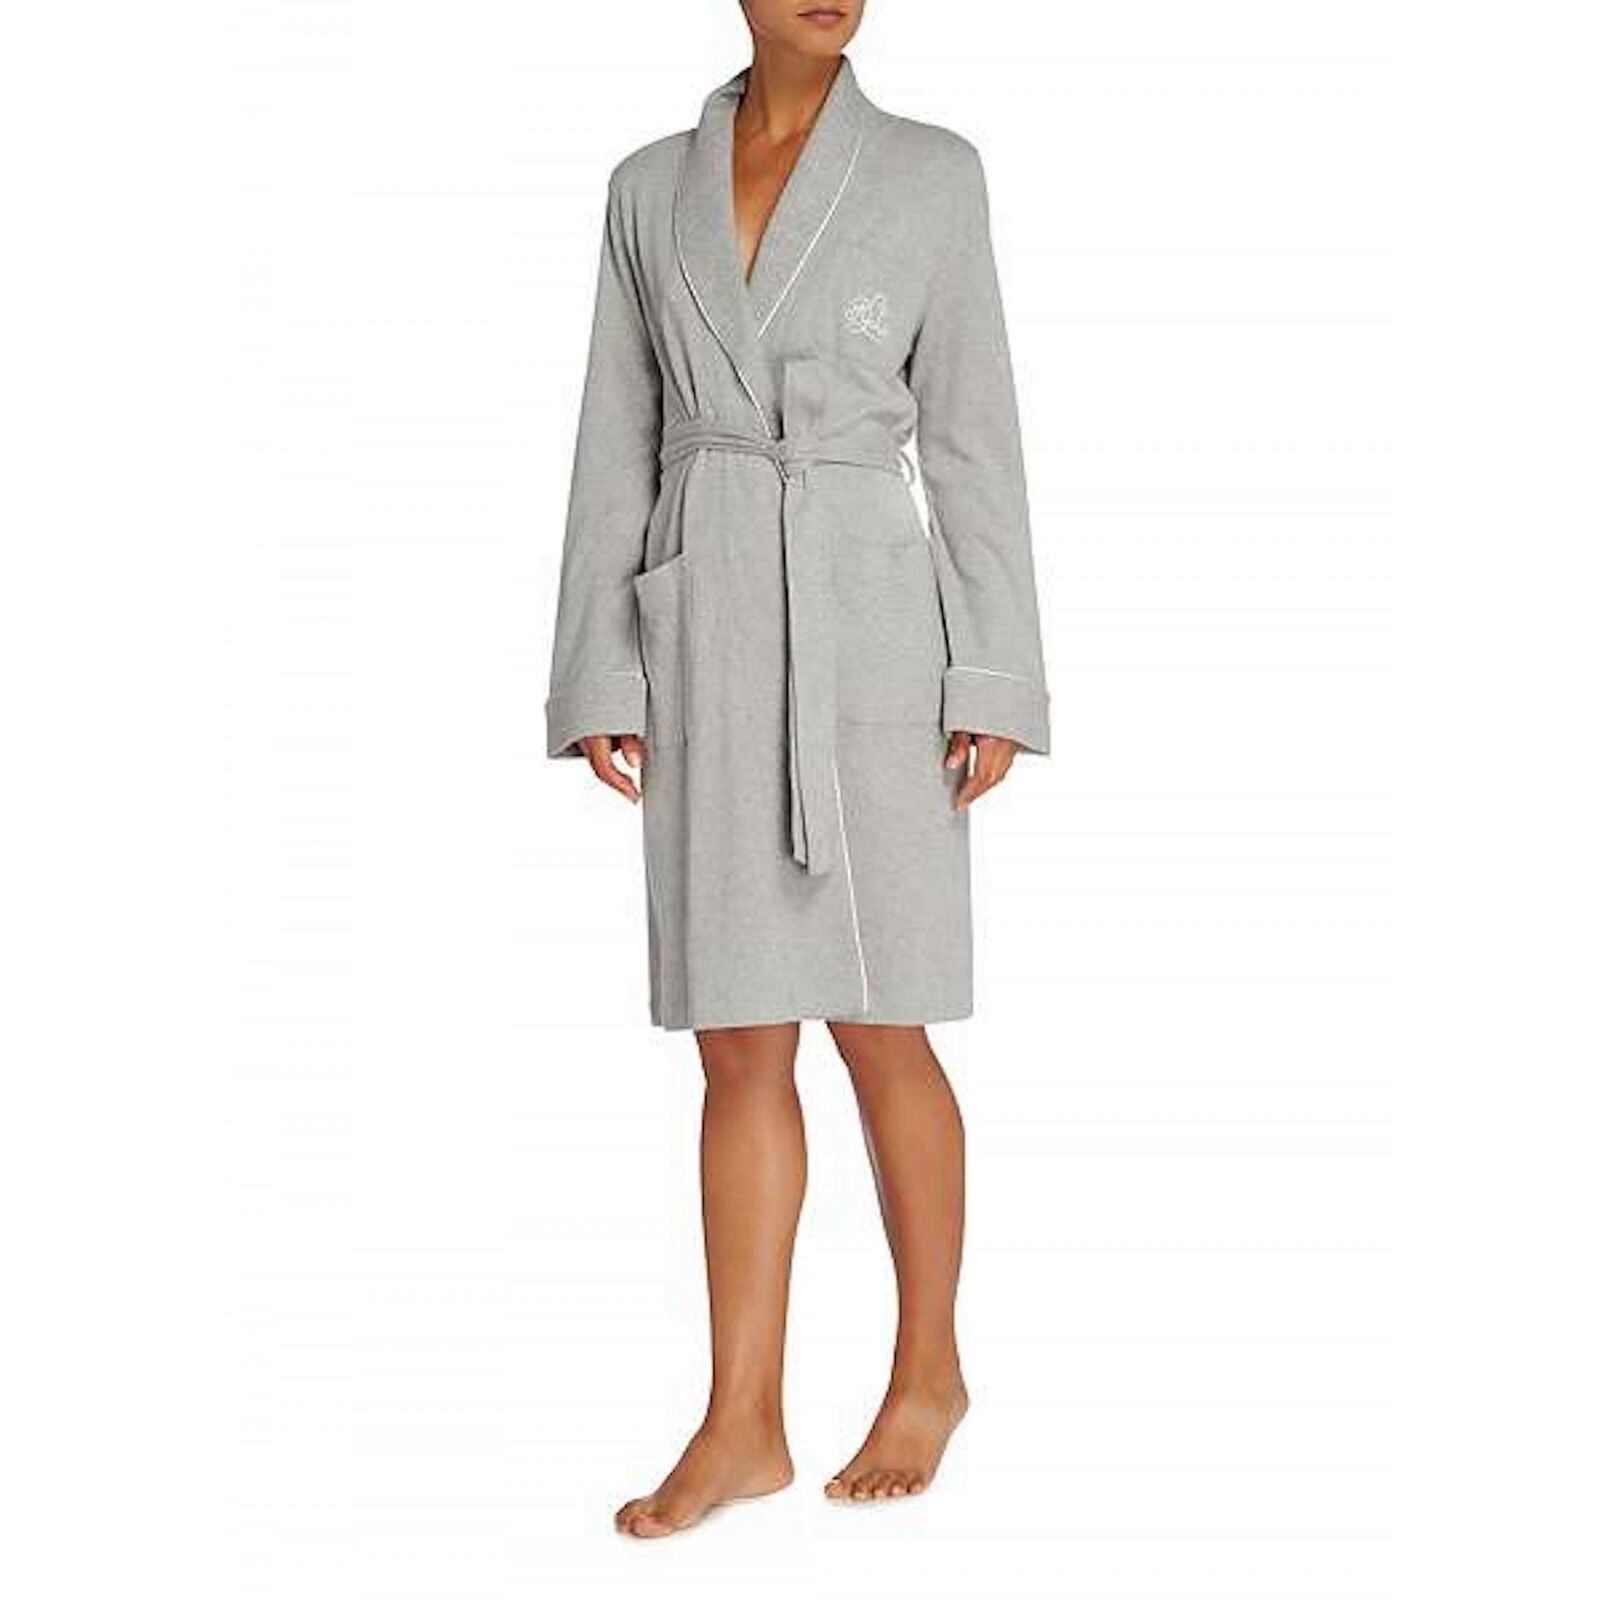 Lauren by Ralph Lauren Essentials 100% Cotton Quilted Collar Robe